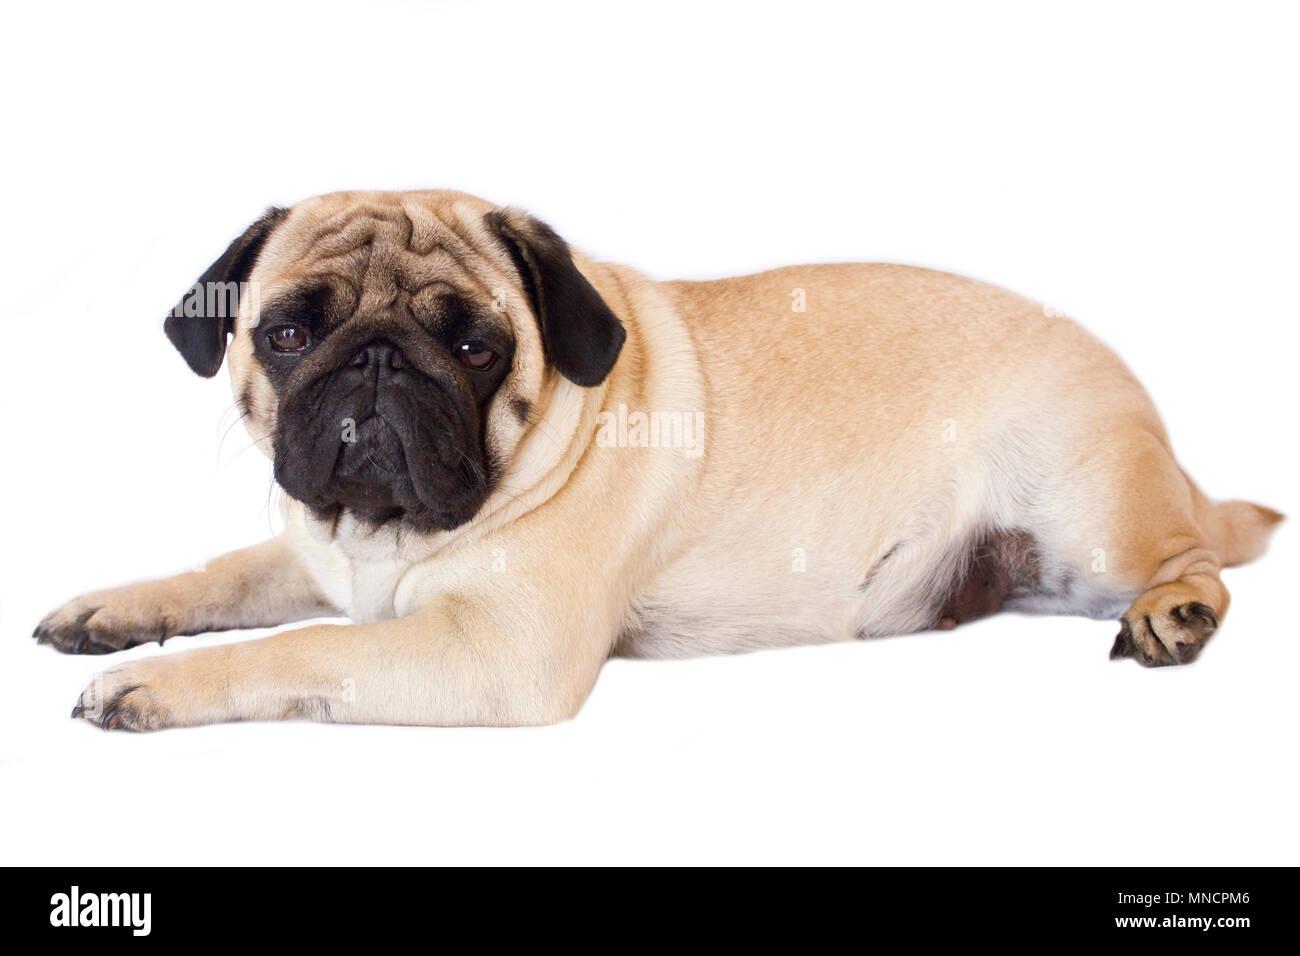 Pug dog isolated. Looking sad with the big eyes - Stock Image